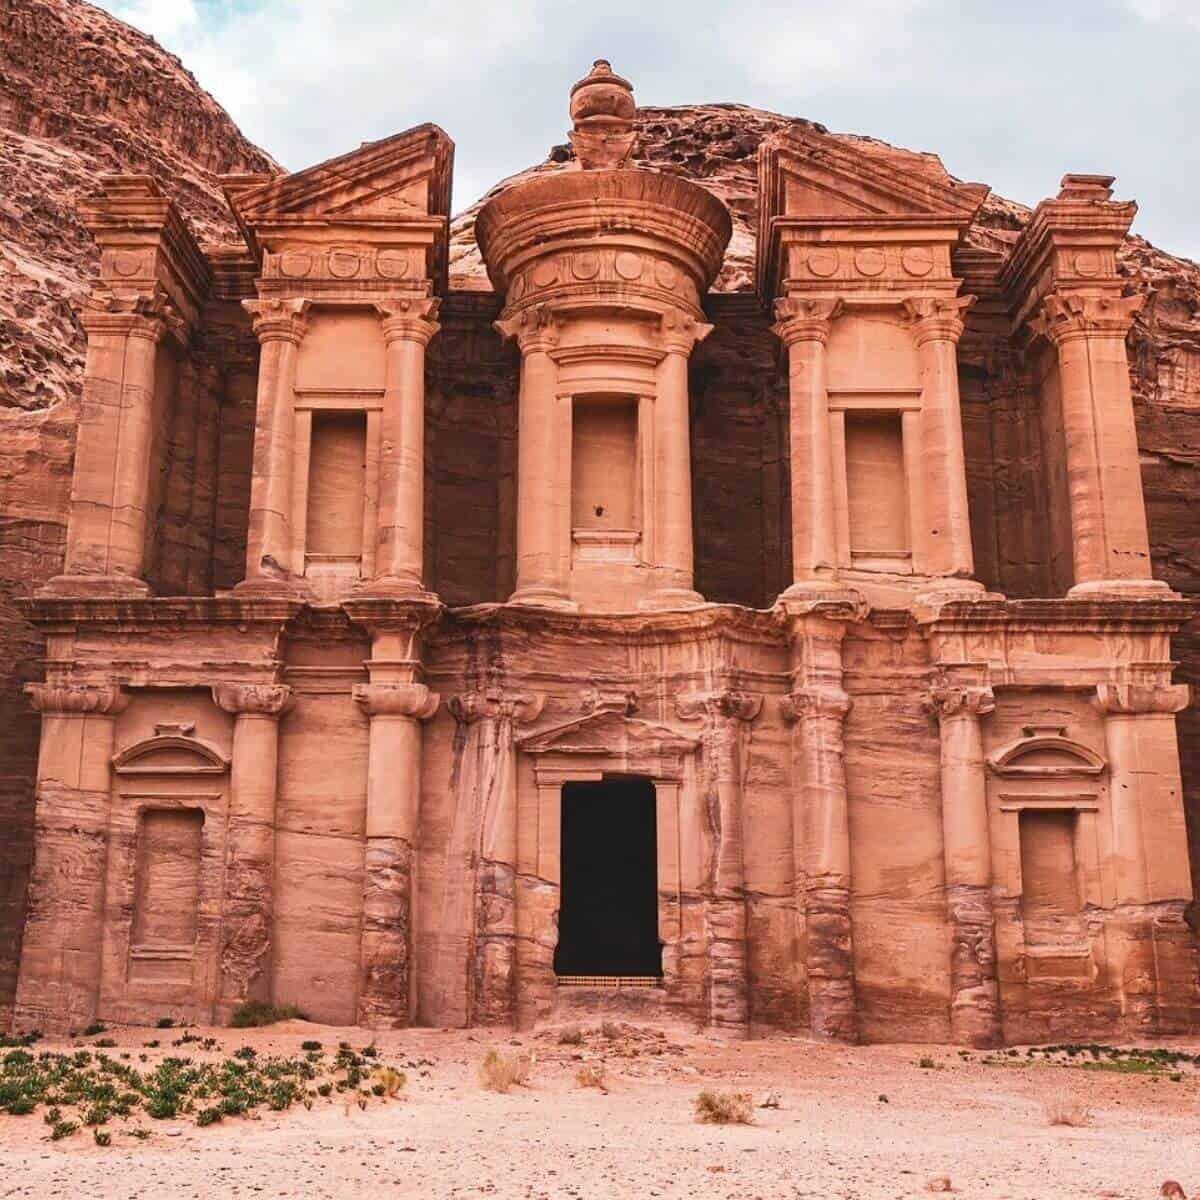 Architecture in Petra, Jordan.